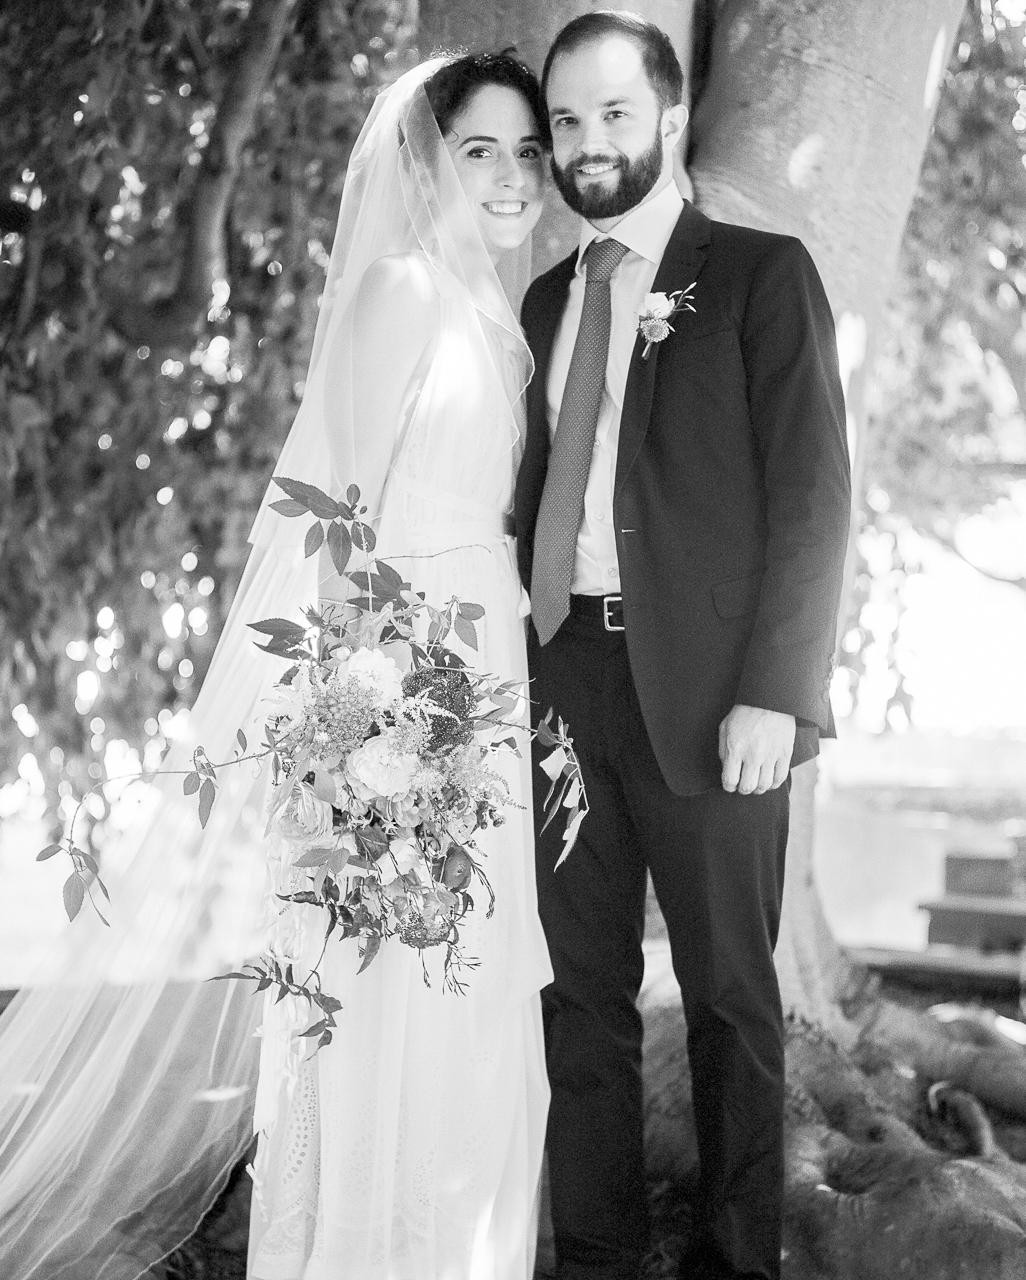 rachel-andrew-wedding-couple-029-s112195-0915.jpg